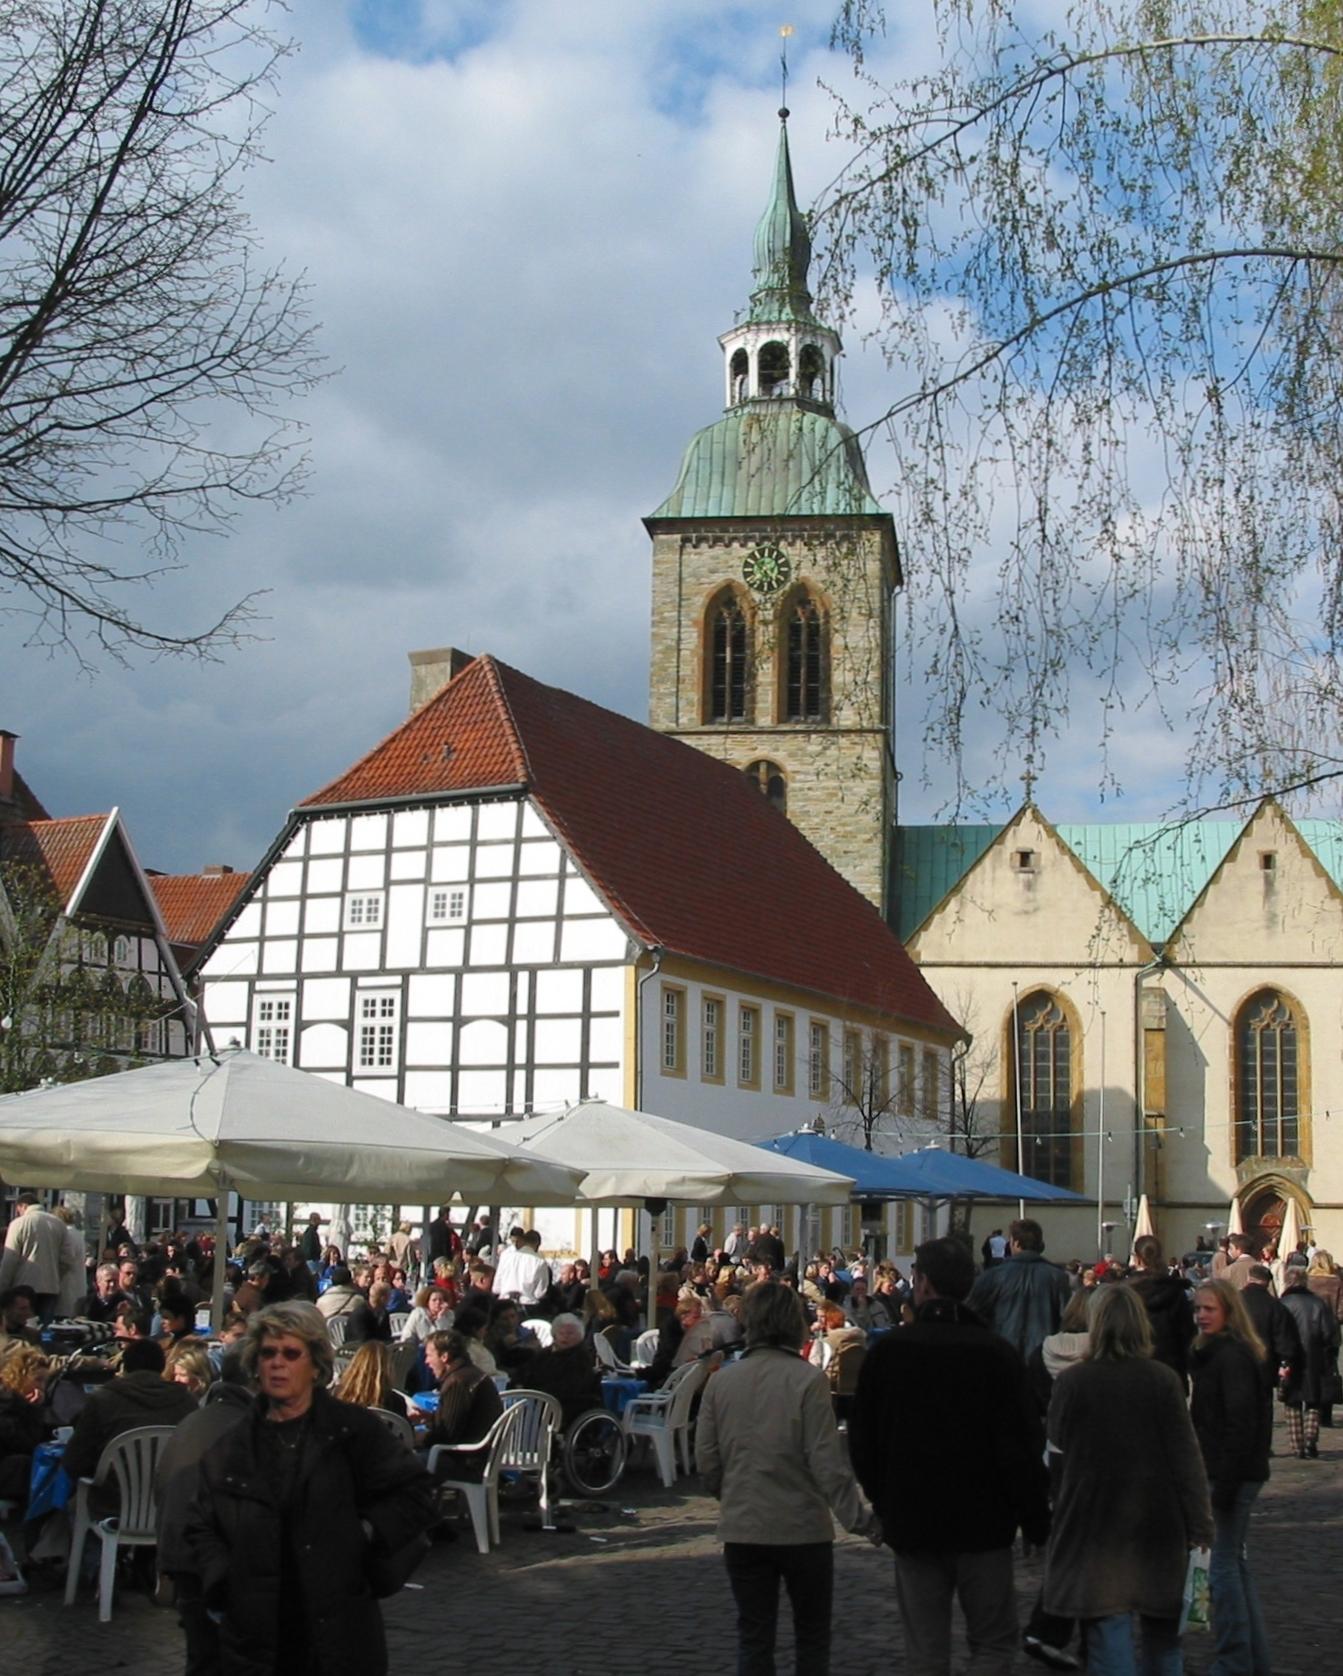 Marktplatz Wiedenbrück